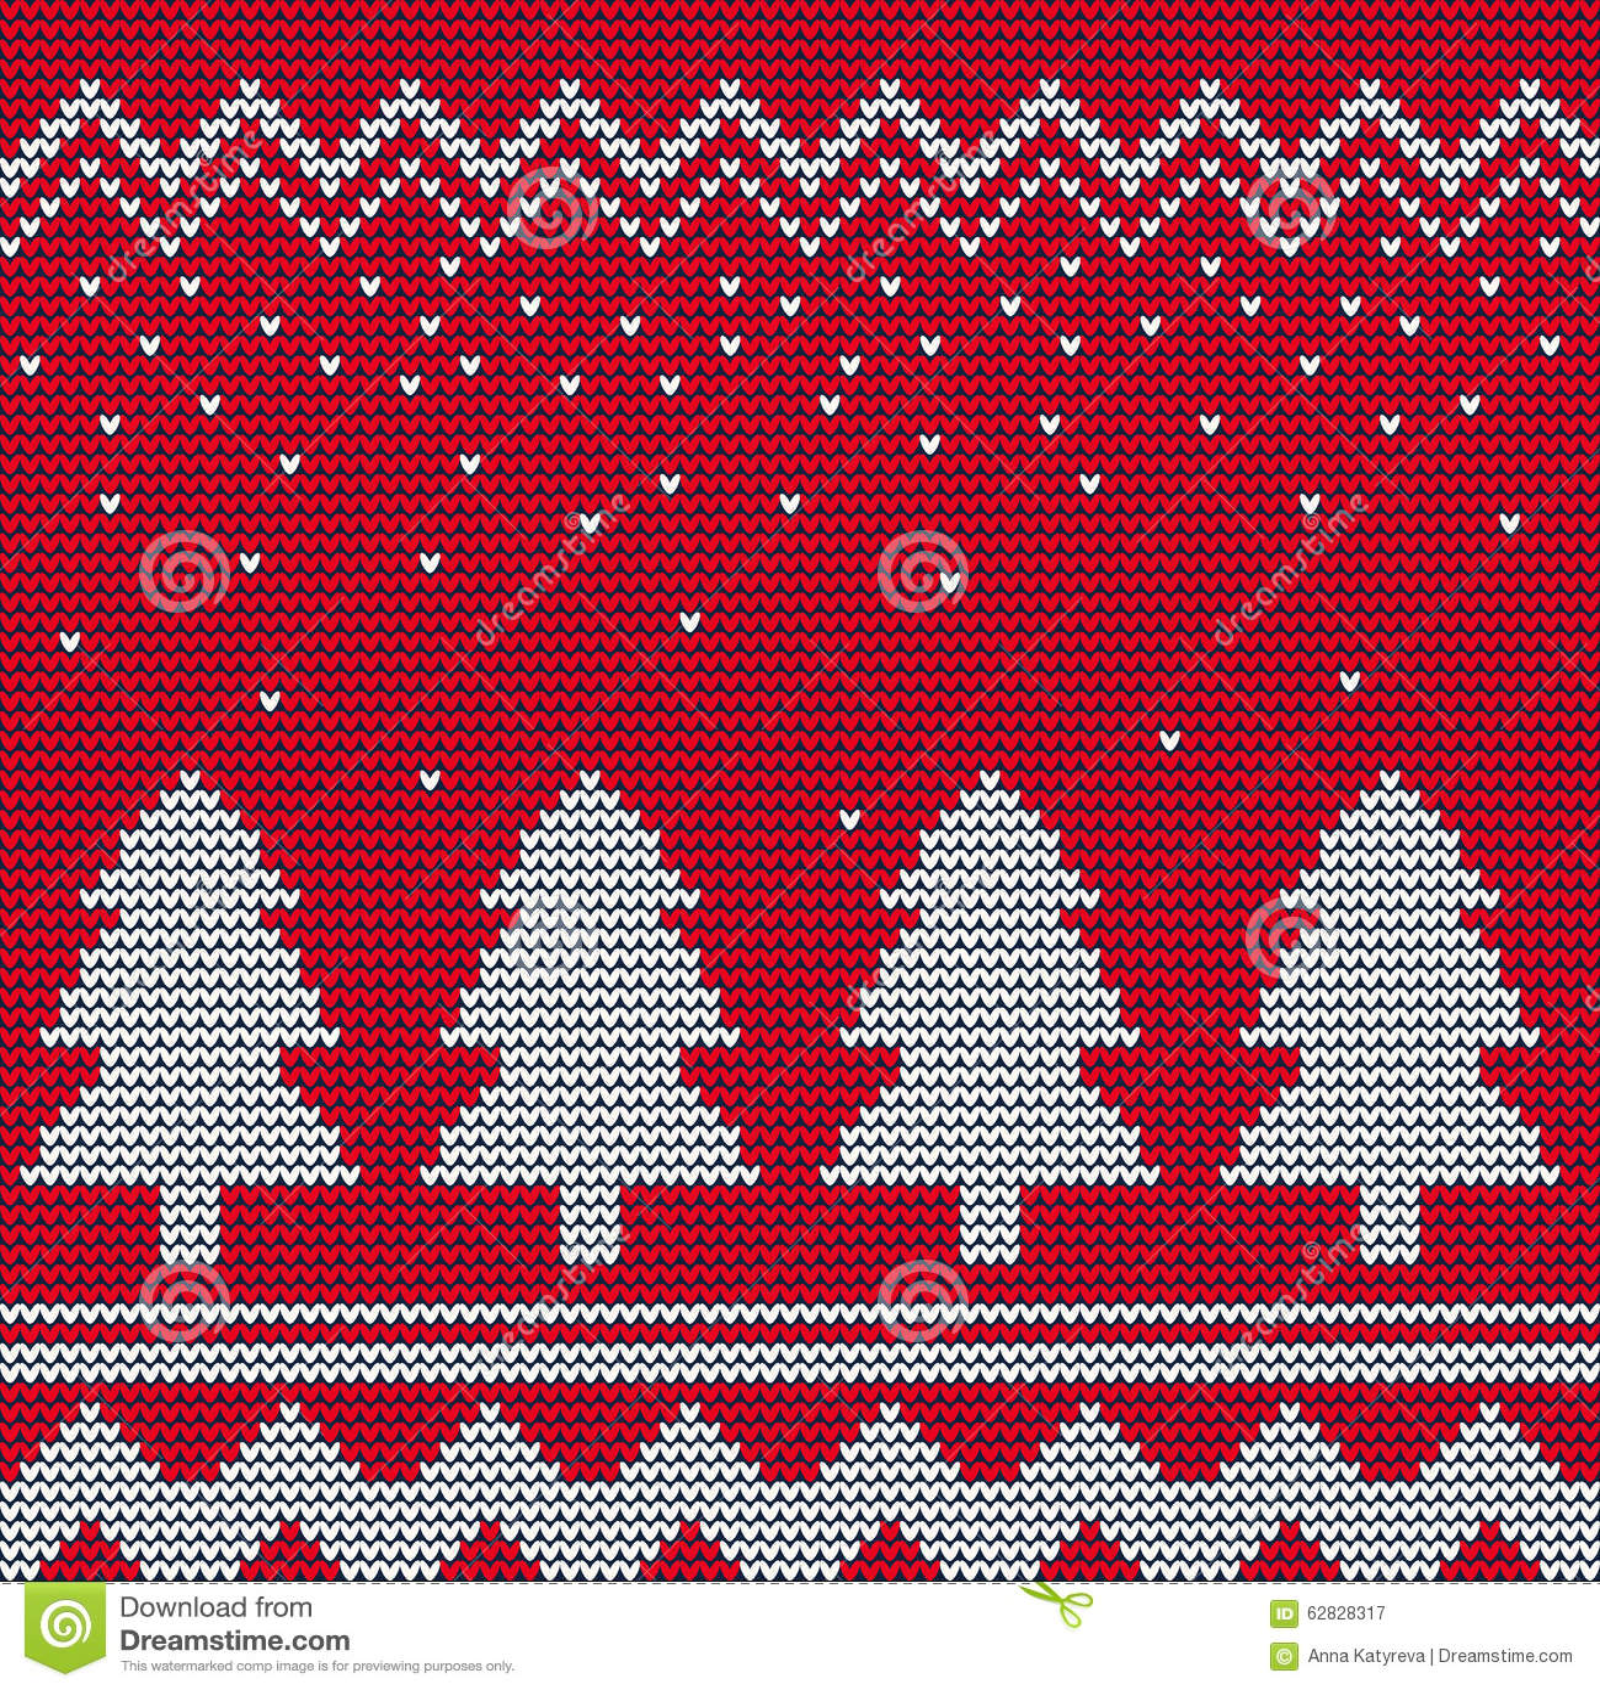 Christmas Ugly Sweater 1 Stock Vector - Image: 62828317